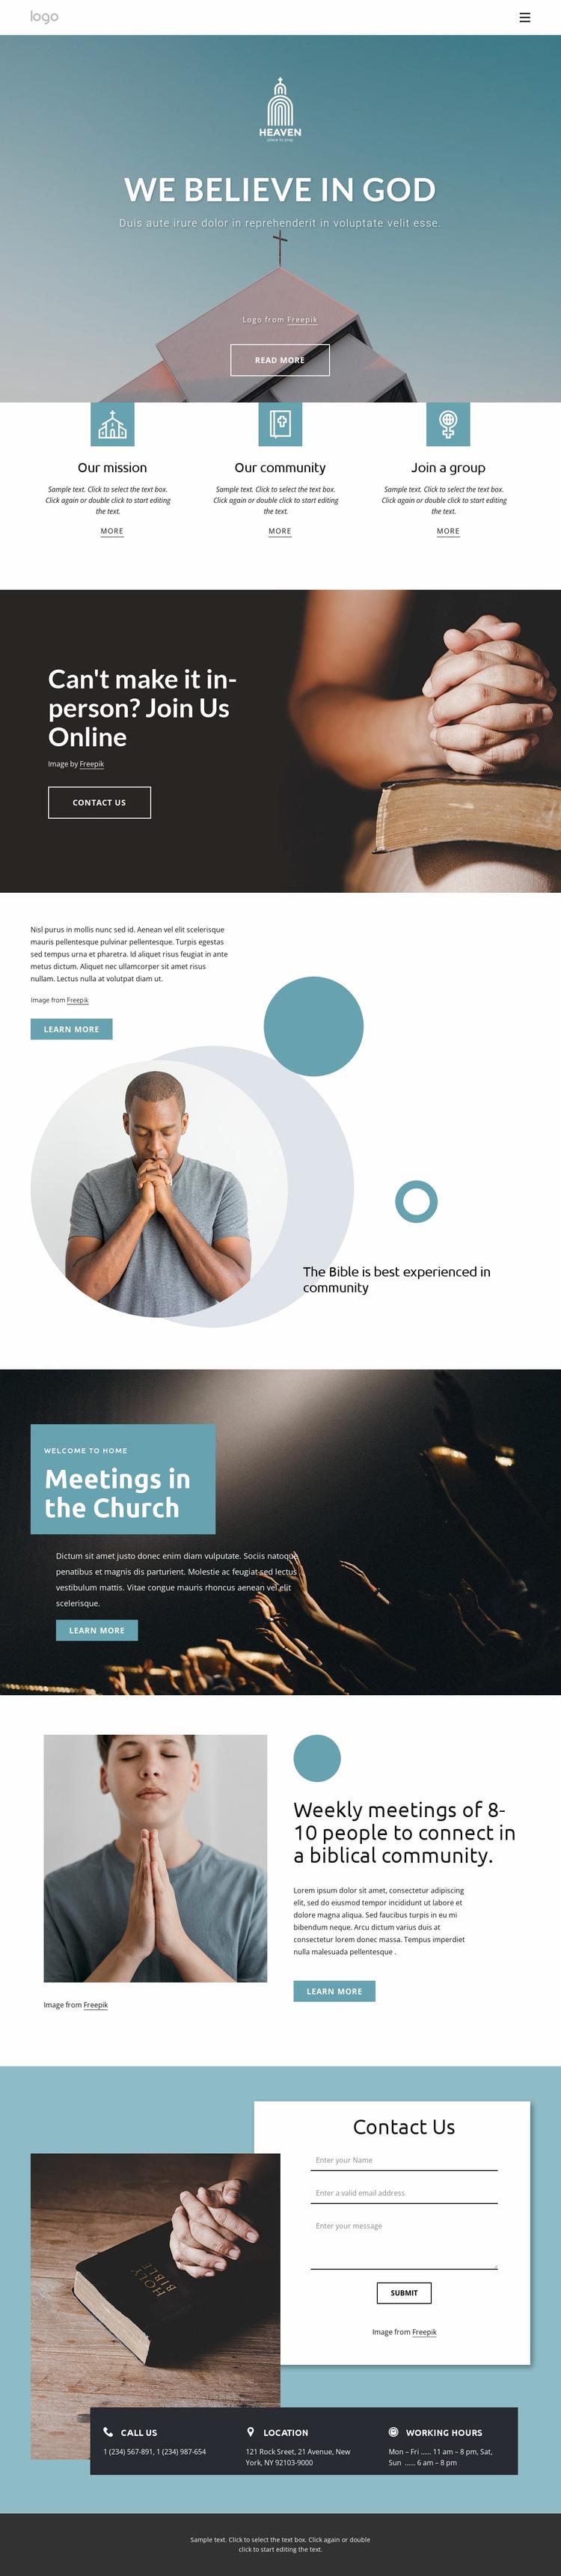 Family friendly church Website Design